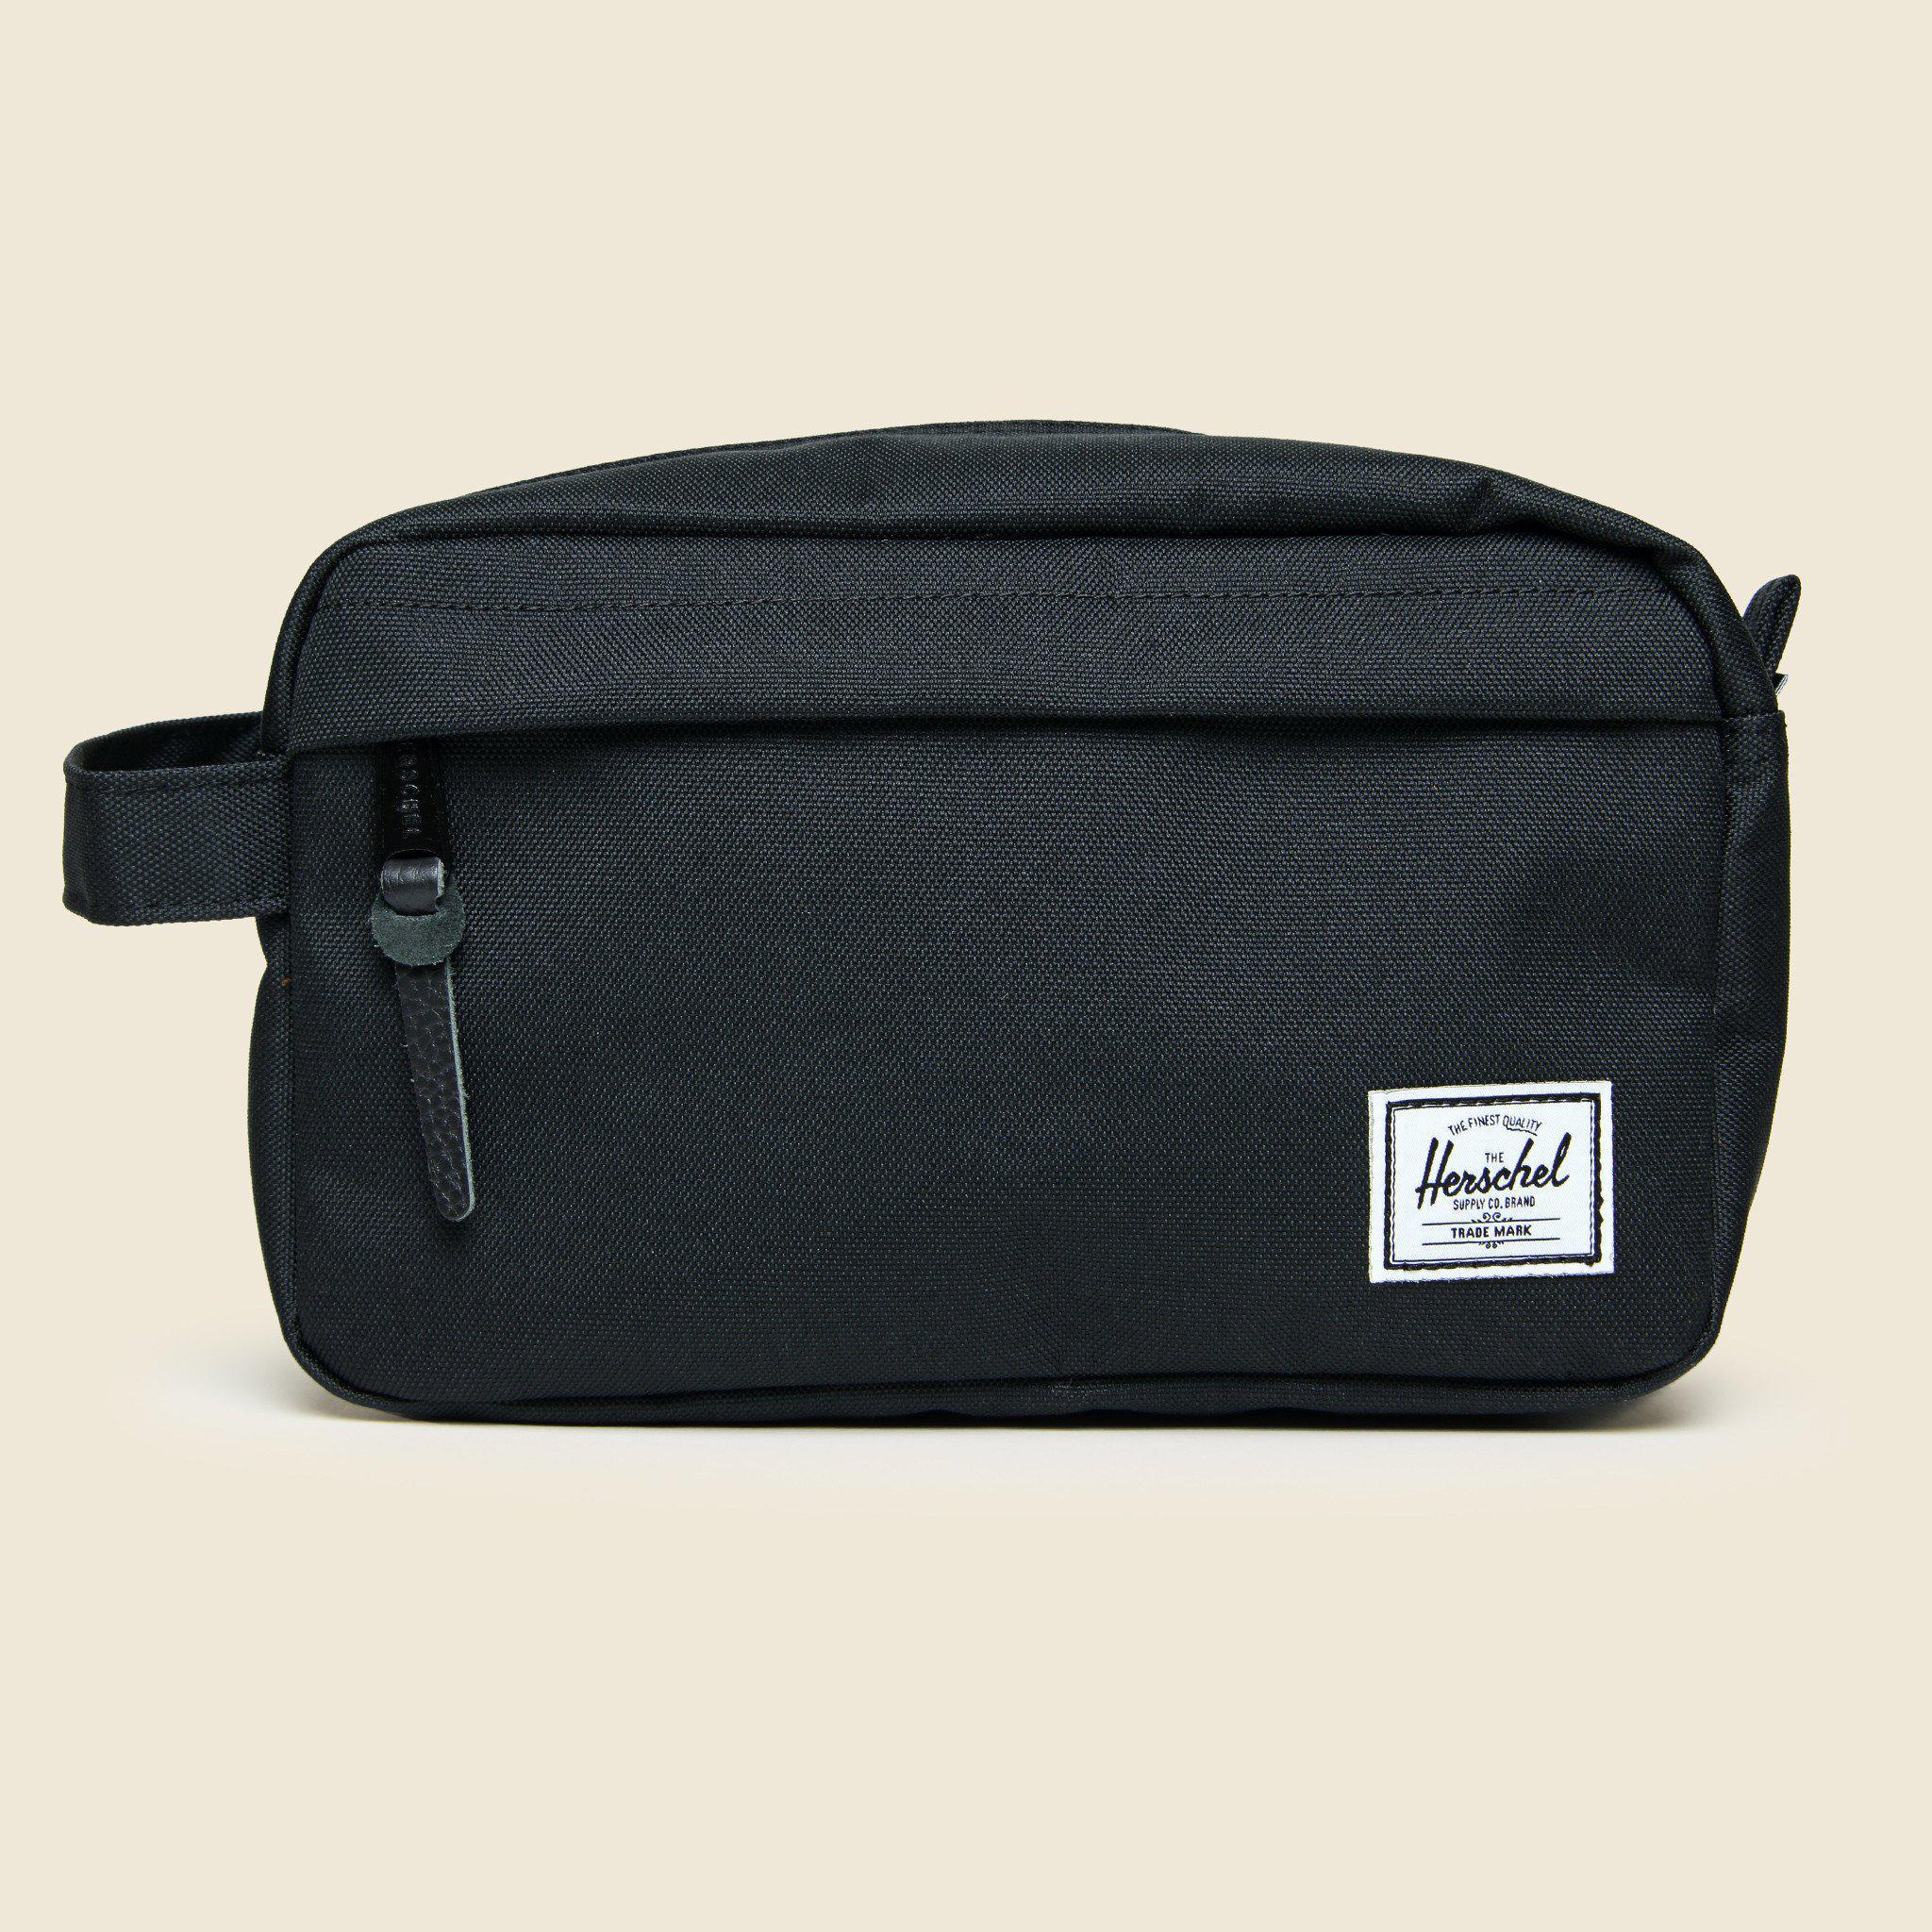 250fd640ec9 Lyst - Herschel Supply Co. Chapter Travel Kit - Black in Black for Men